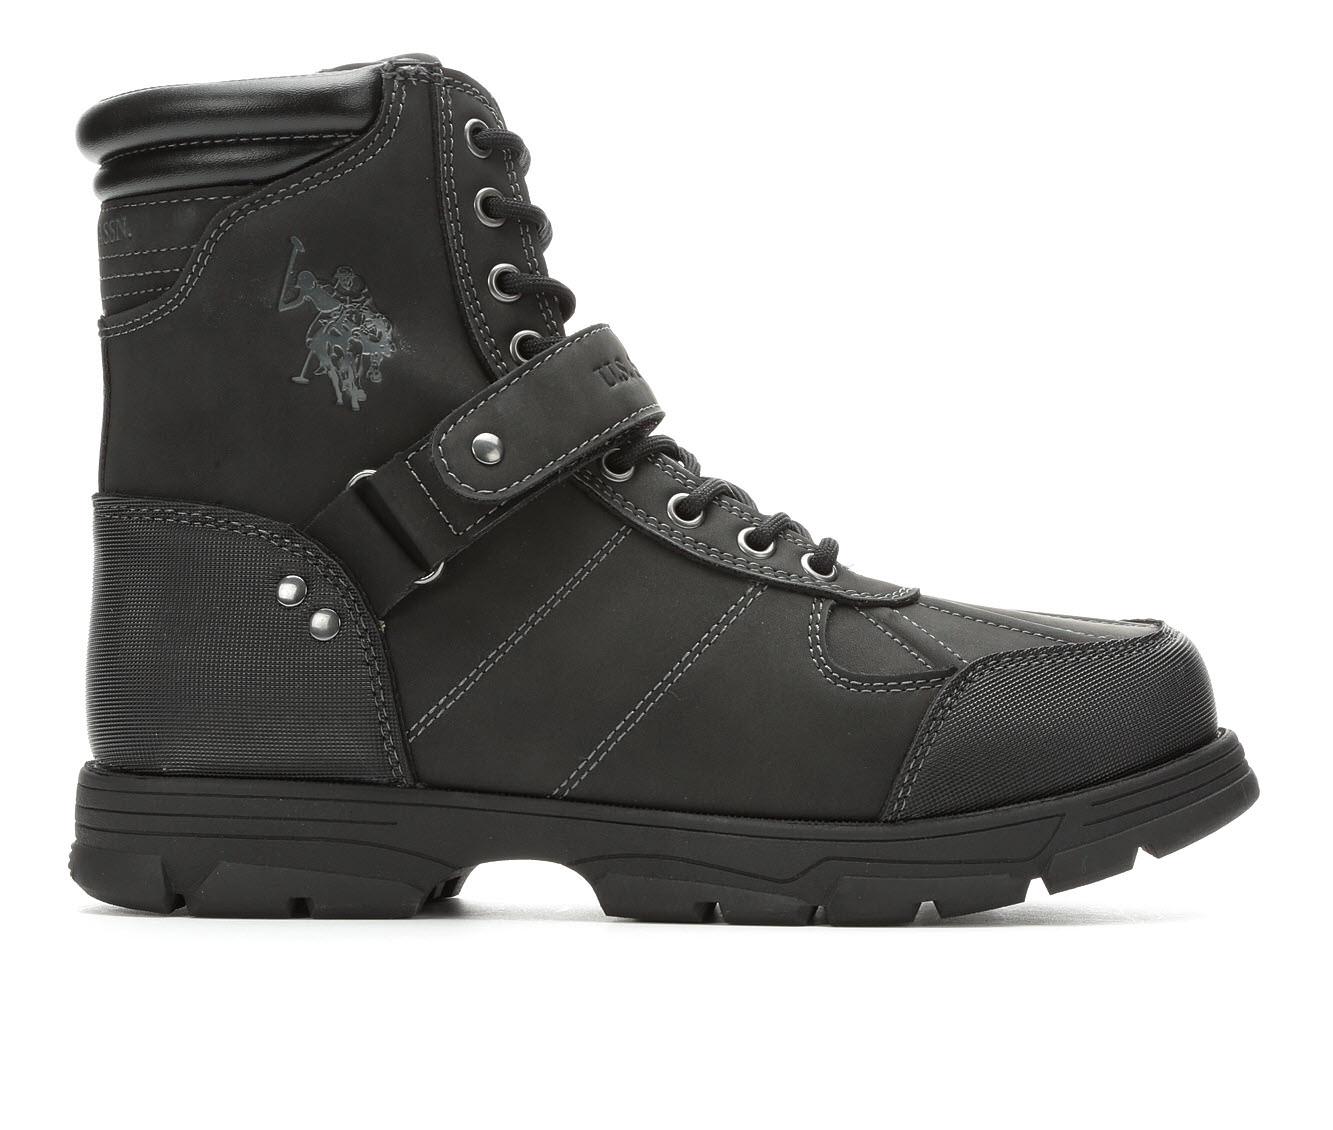 US Polo Assn Connor Men's Boots (Black Faux Leather)